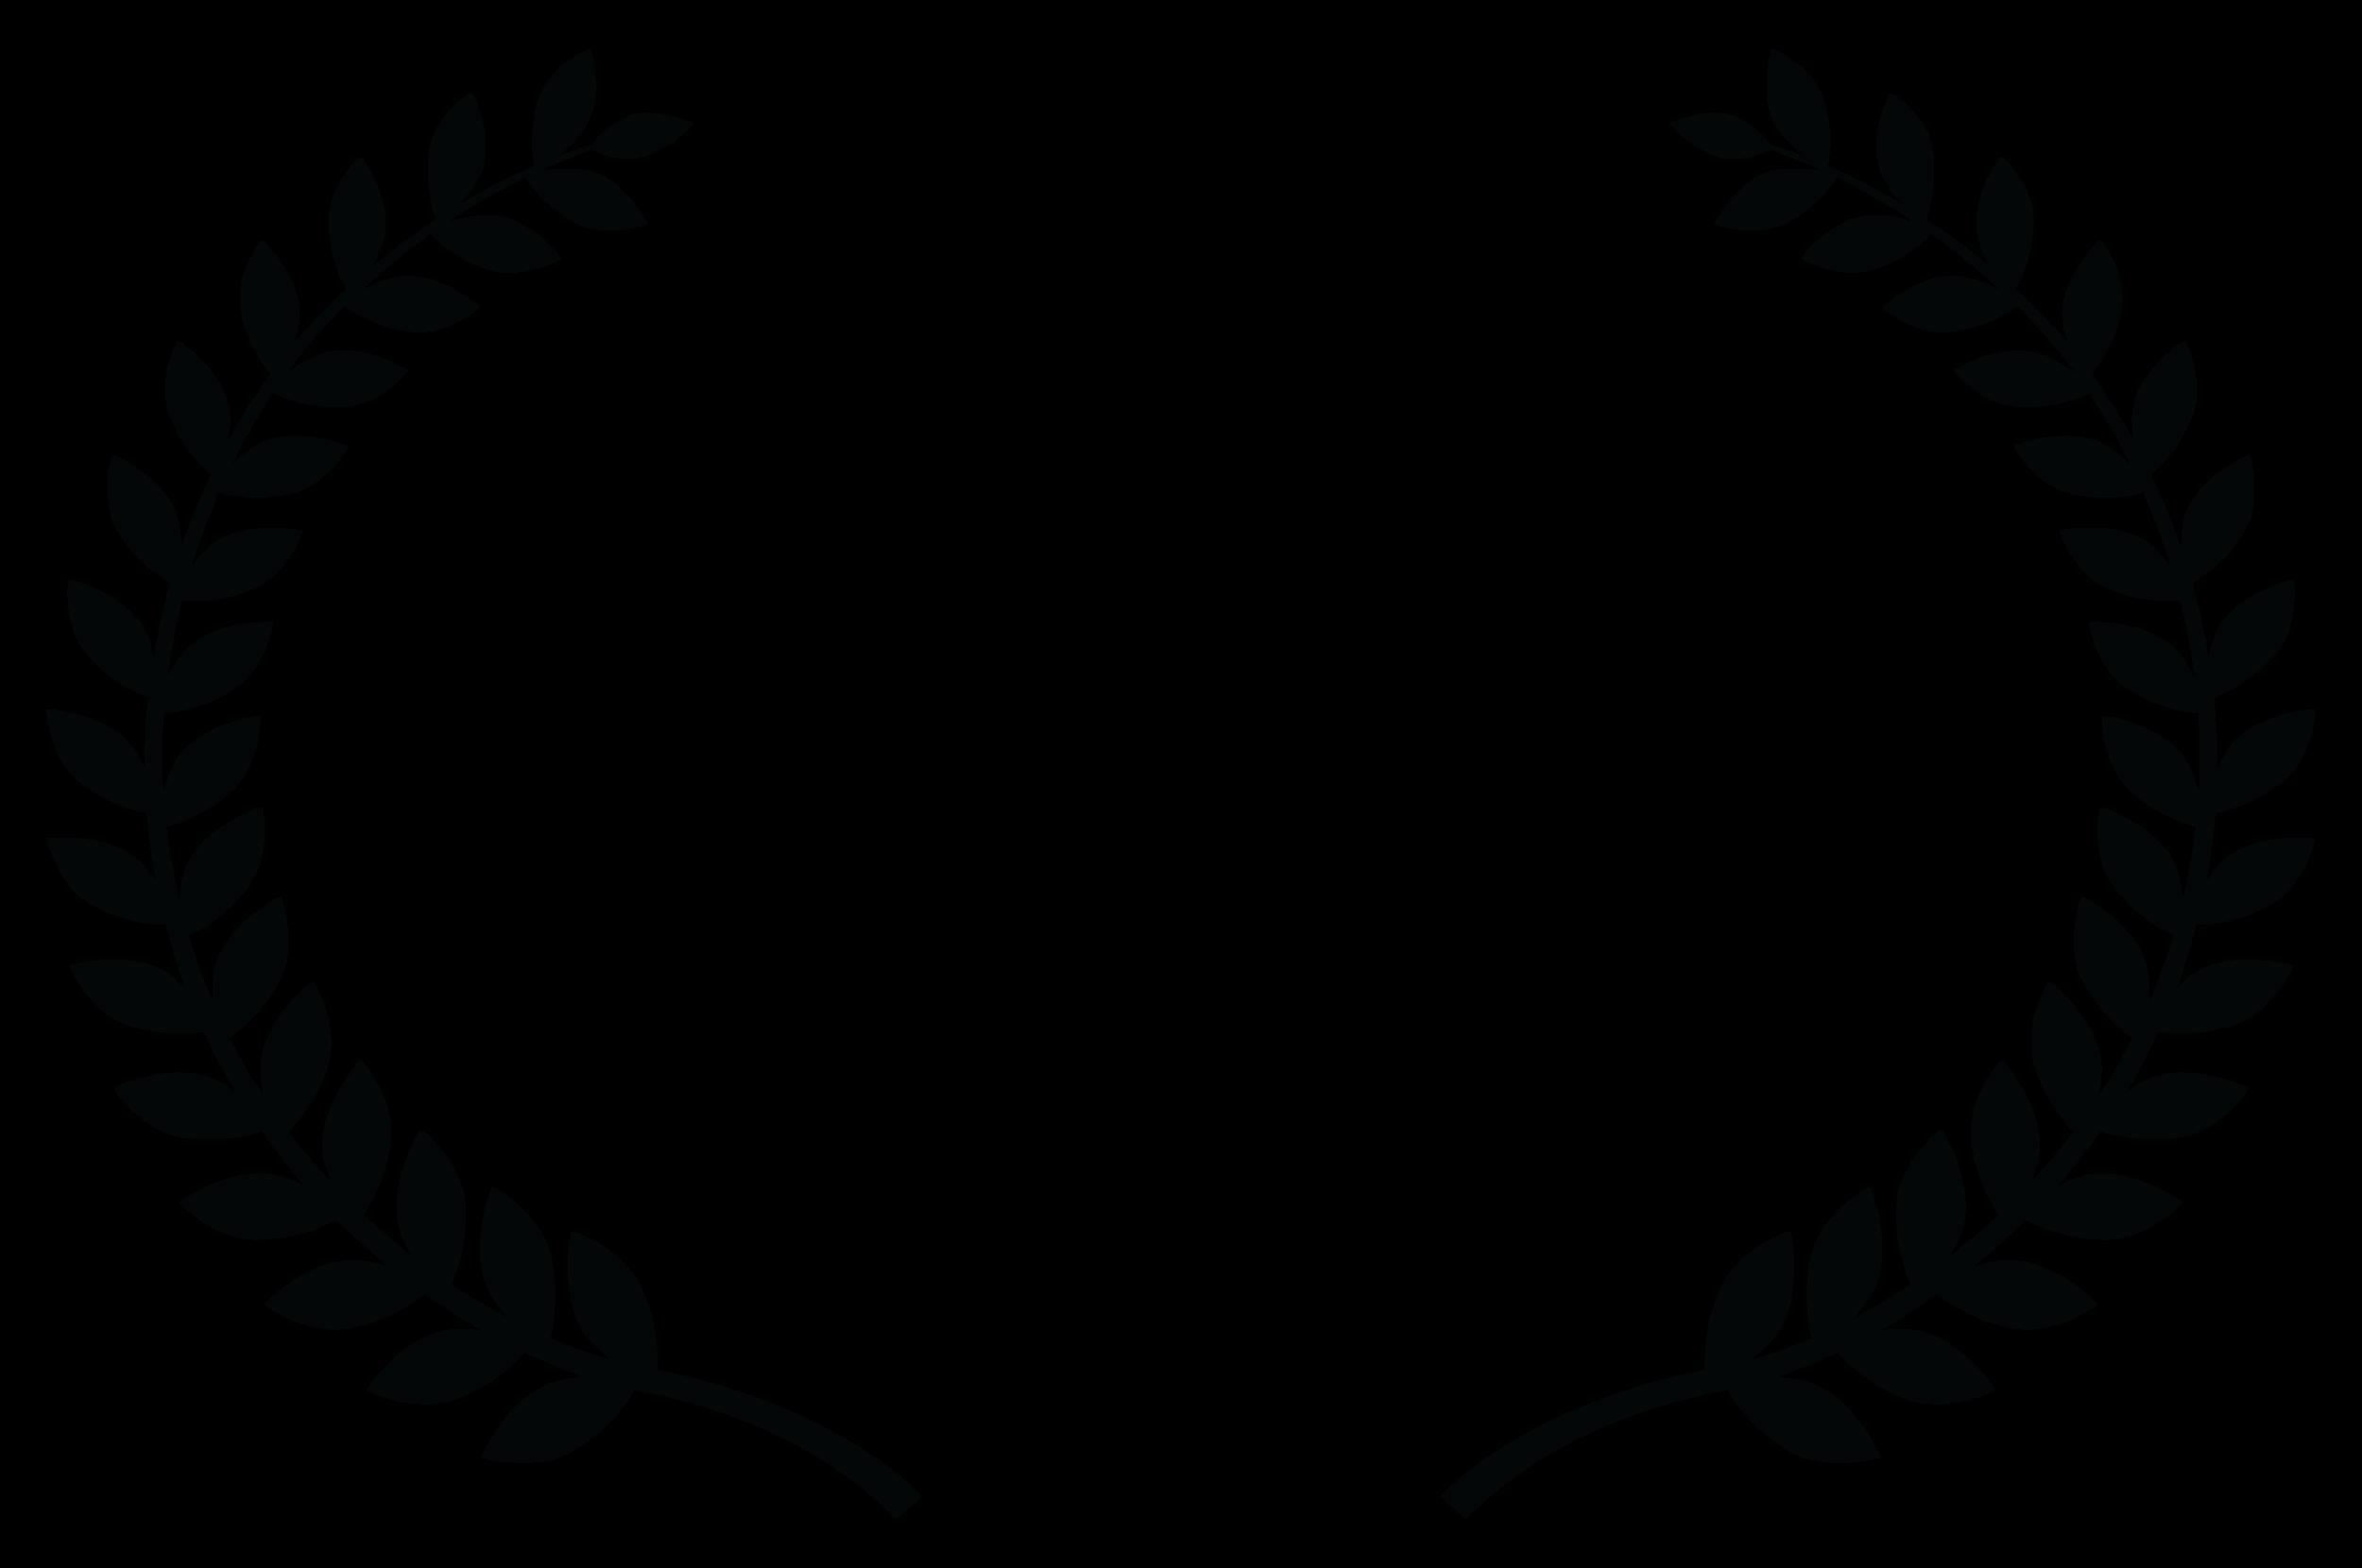 OFFICIALSELECTION-BostonLatinoInternationalFilmFestival-2018.png